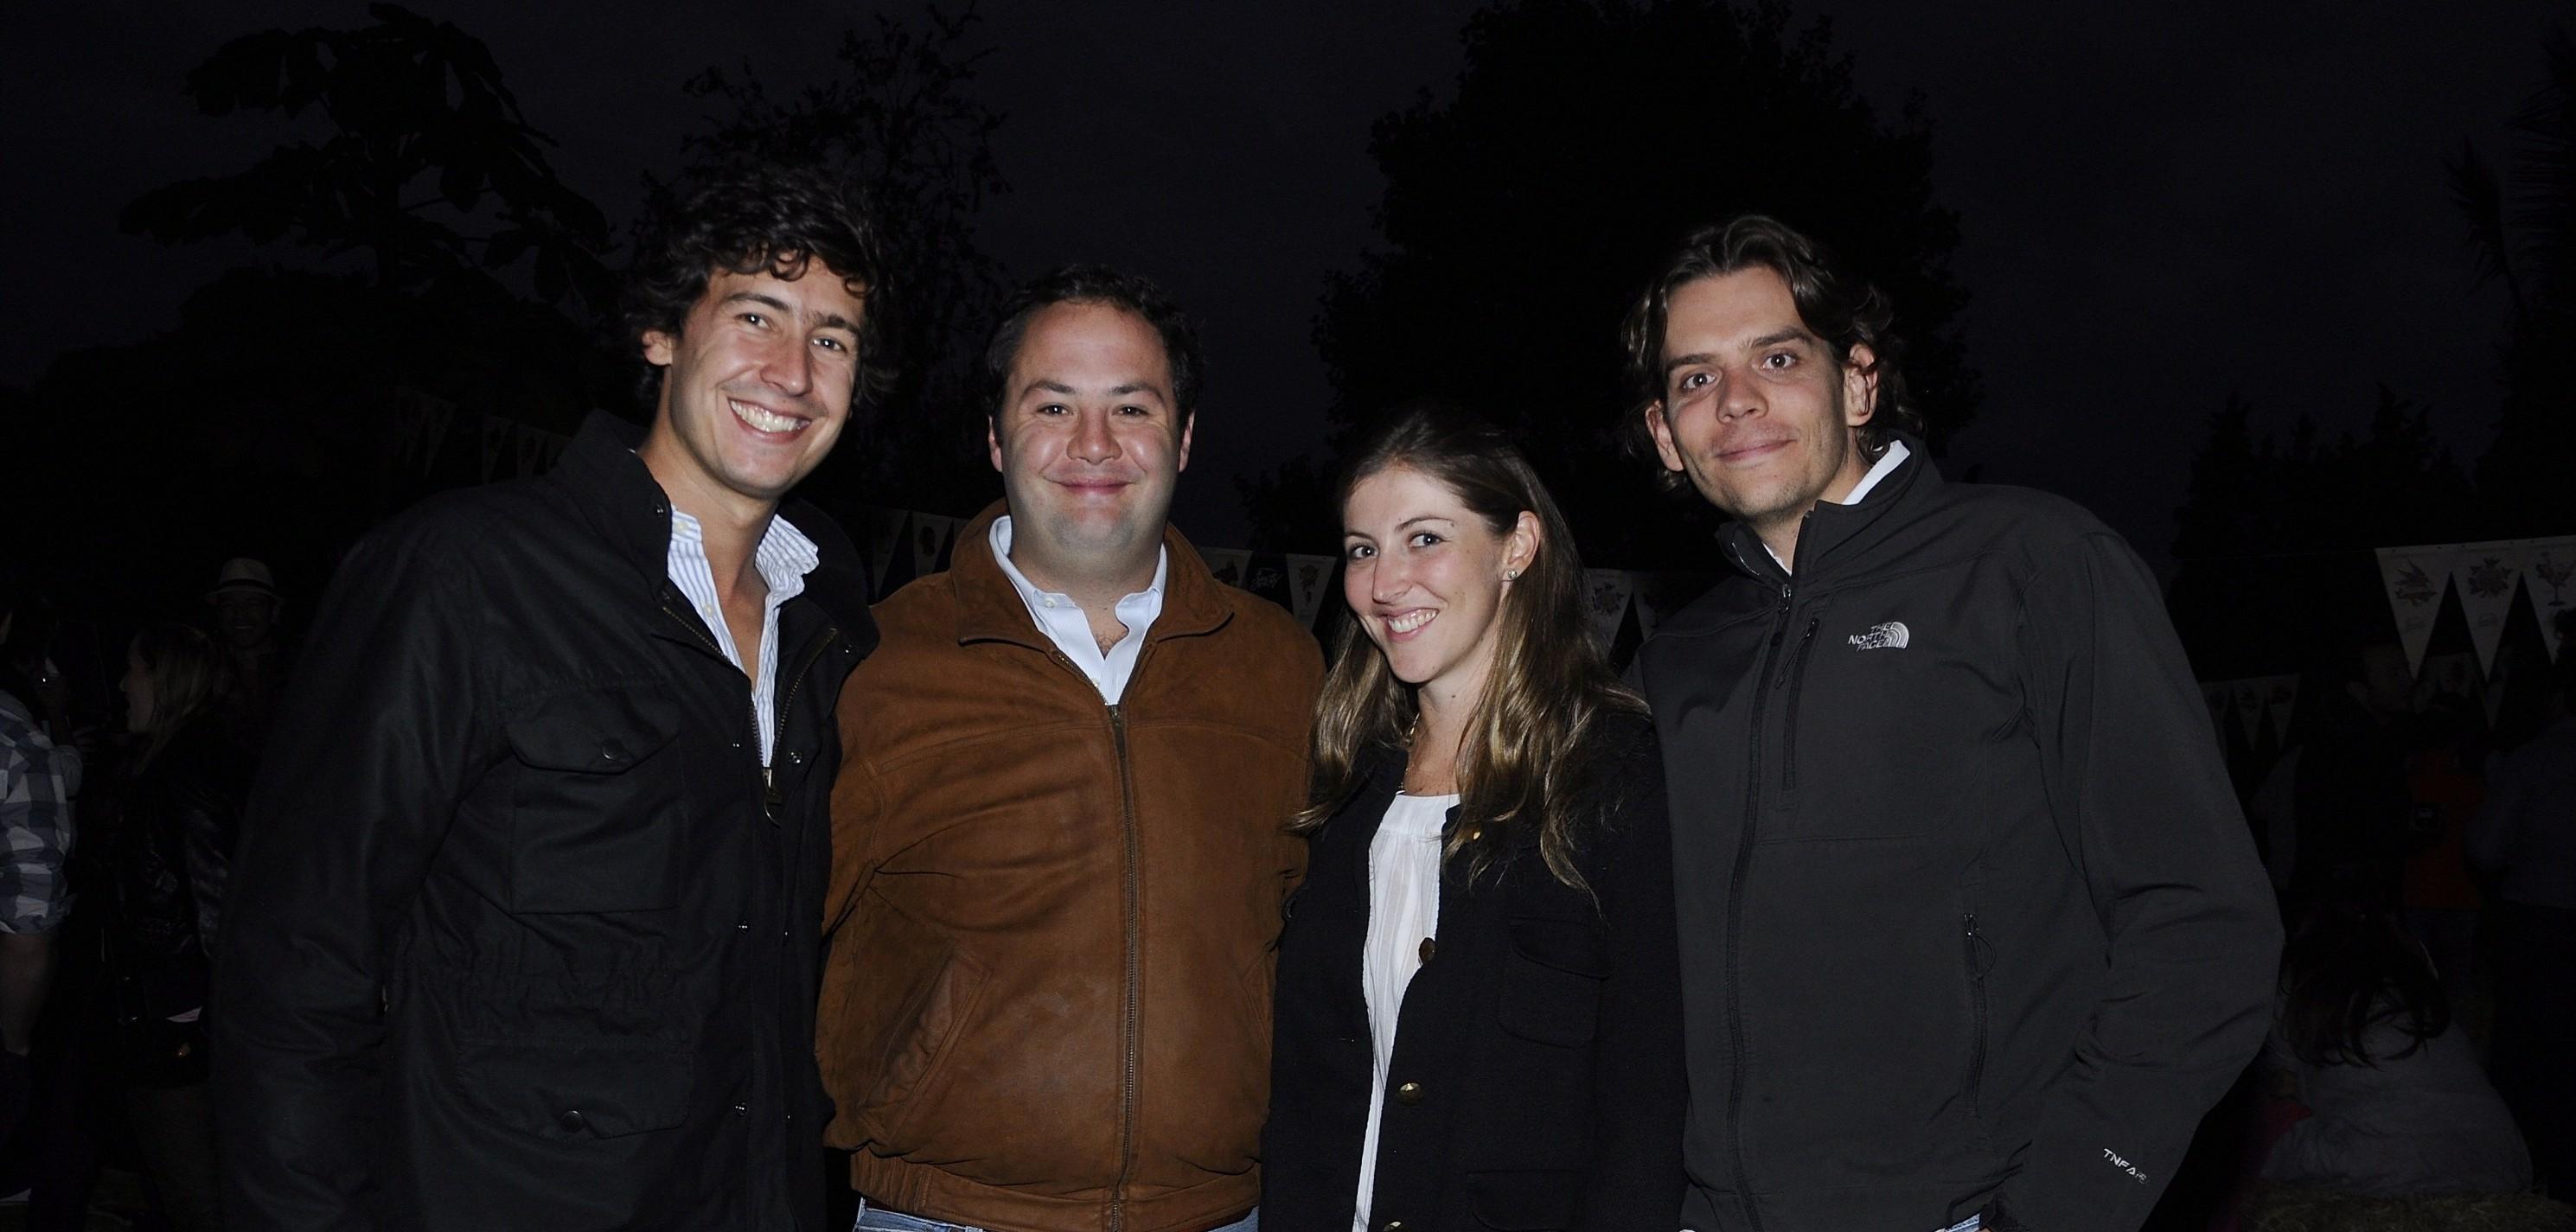 Manuel Restrepo, Martin Ospina, Laura Arboleda, Alejandro Holguin